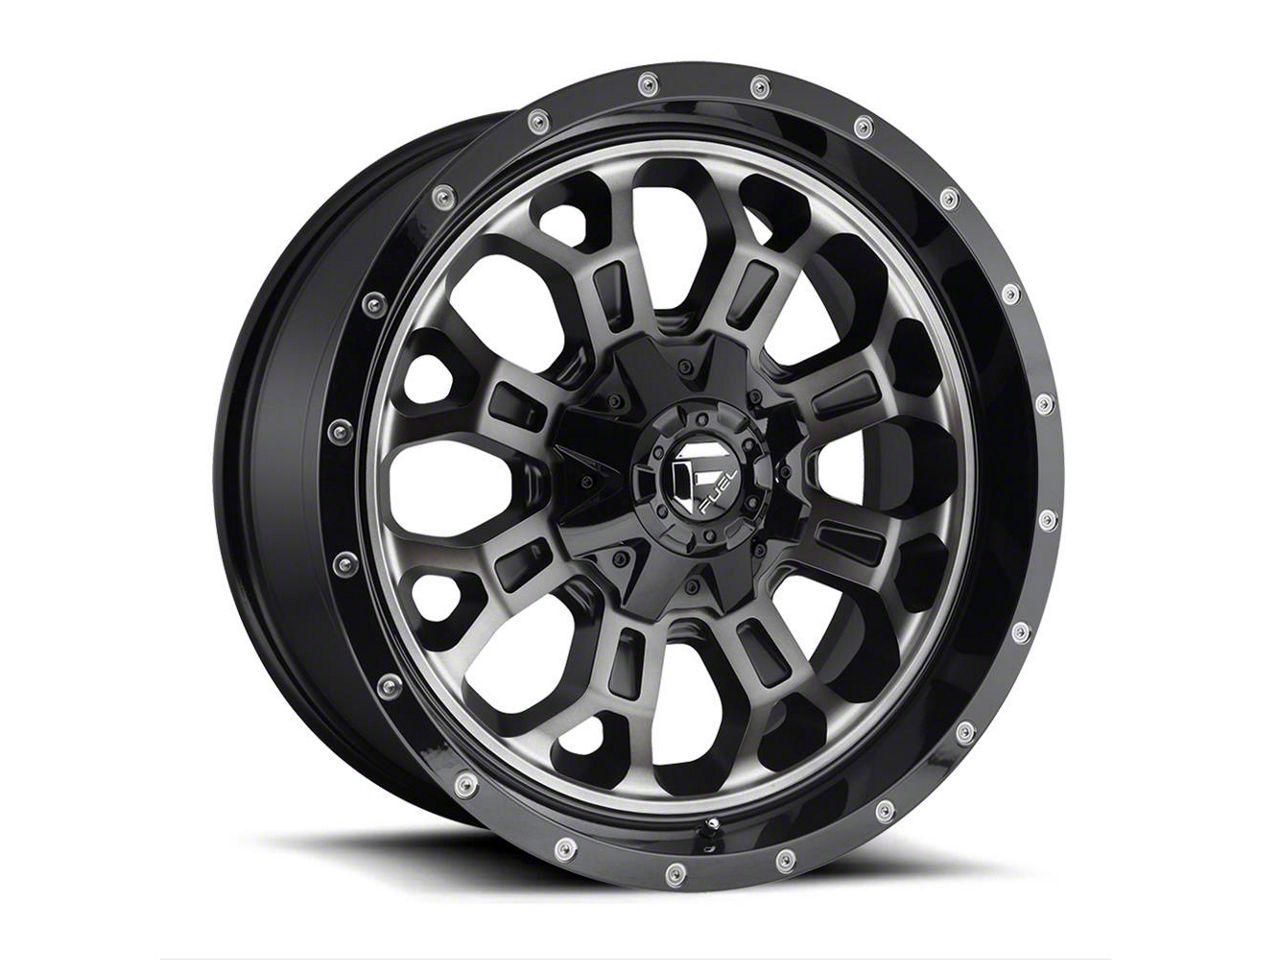 Fuel Wheels Crush Matte Black Machined 5-Lug Wheel - 20x10 (02-18 RAM 1500, Excluding Mega Cab)